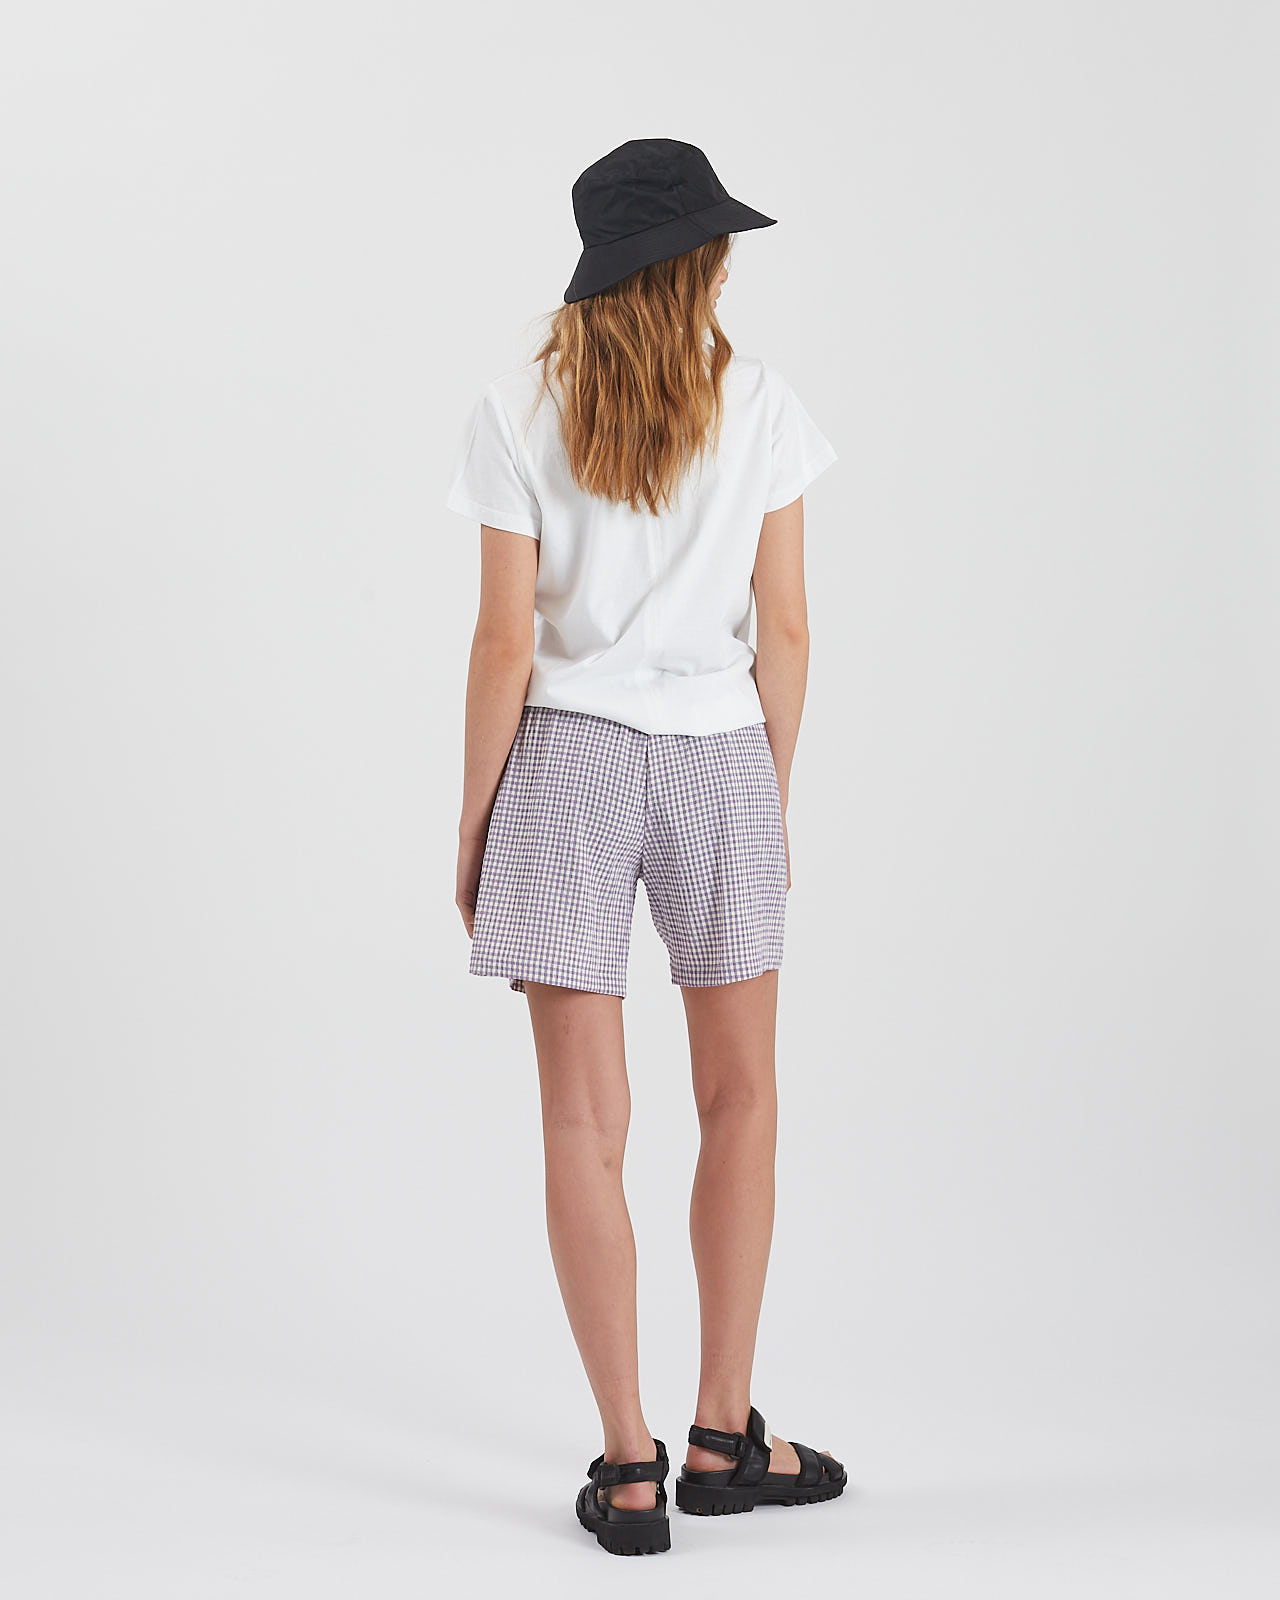 Moves Pynna shorts, lavender, 36